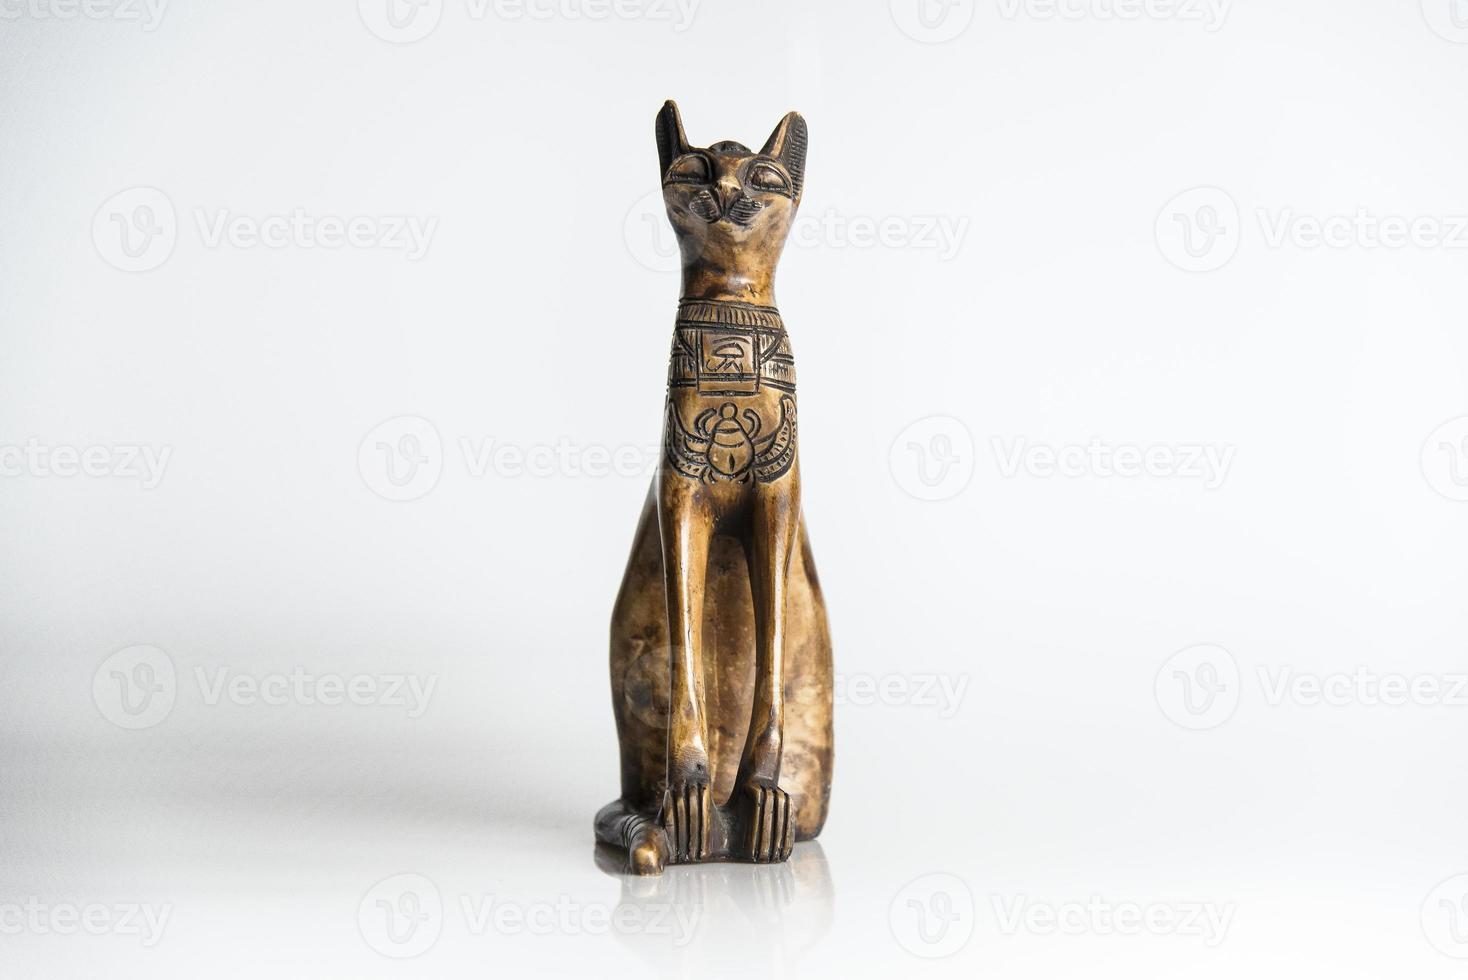 houten kat - souvenir uit Egypte foto